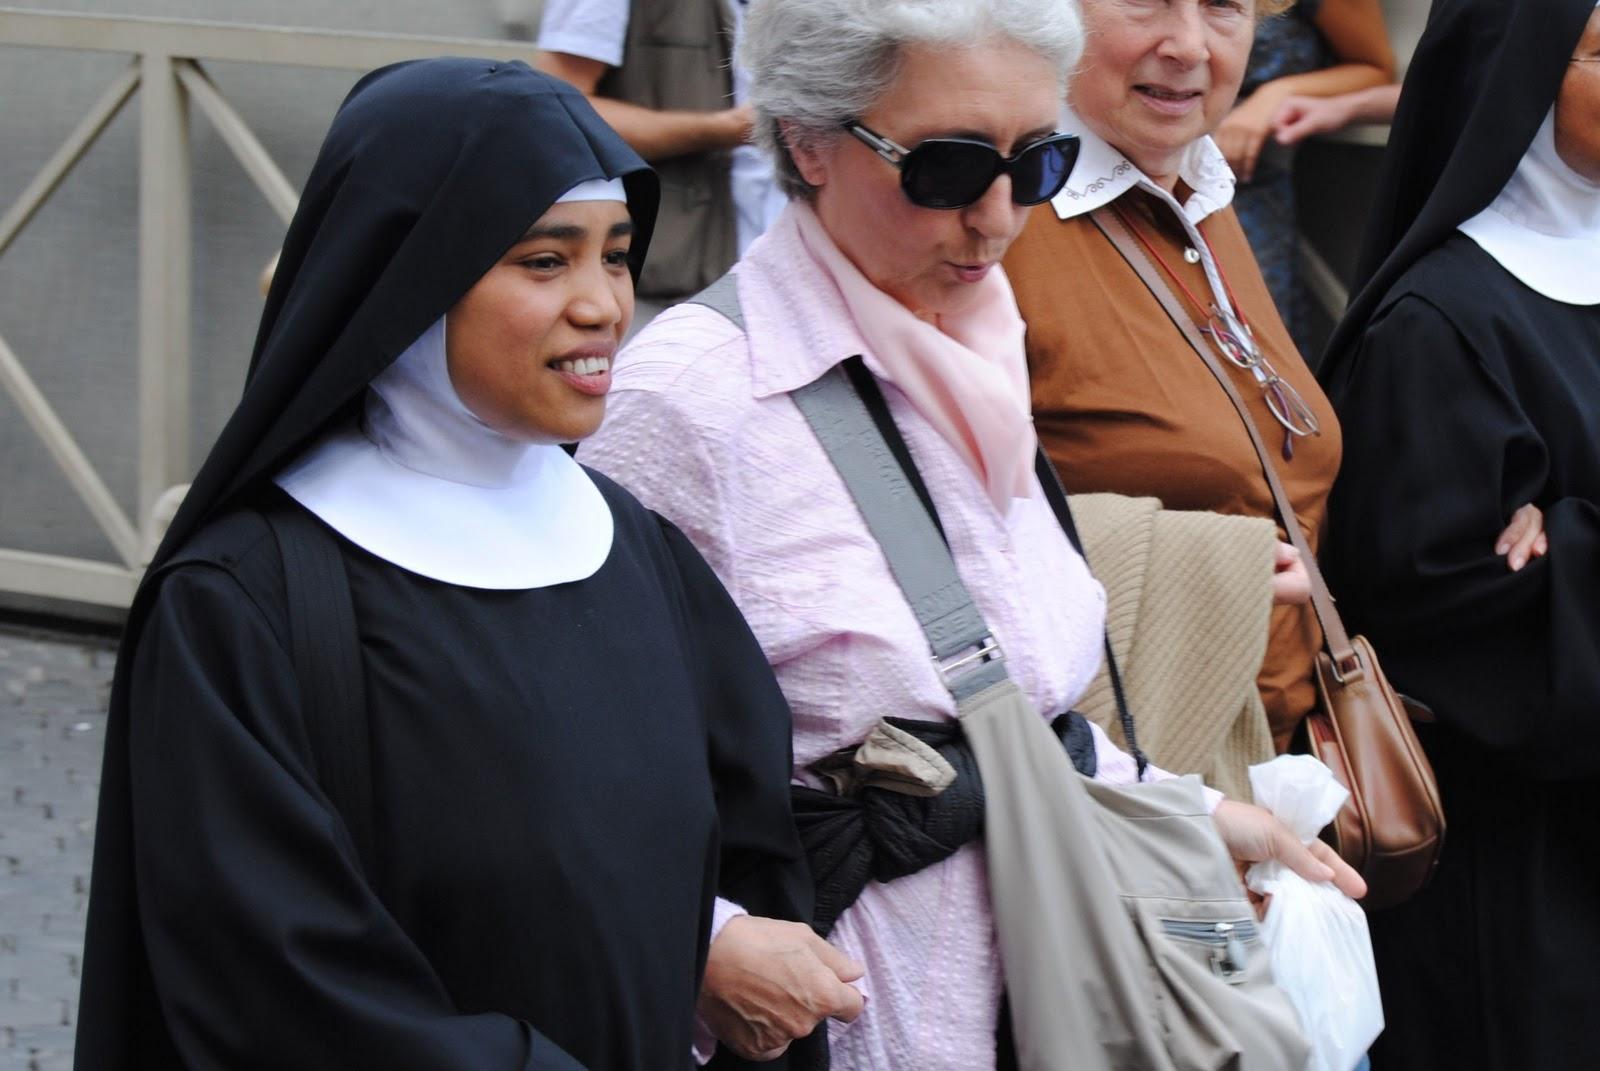 orbis catholicus secundus: be a nun